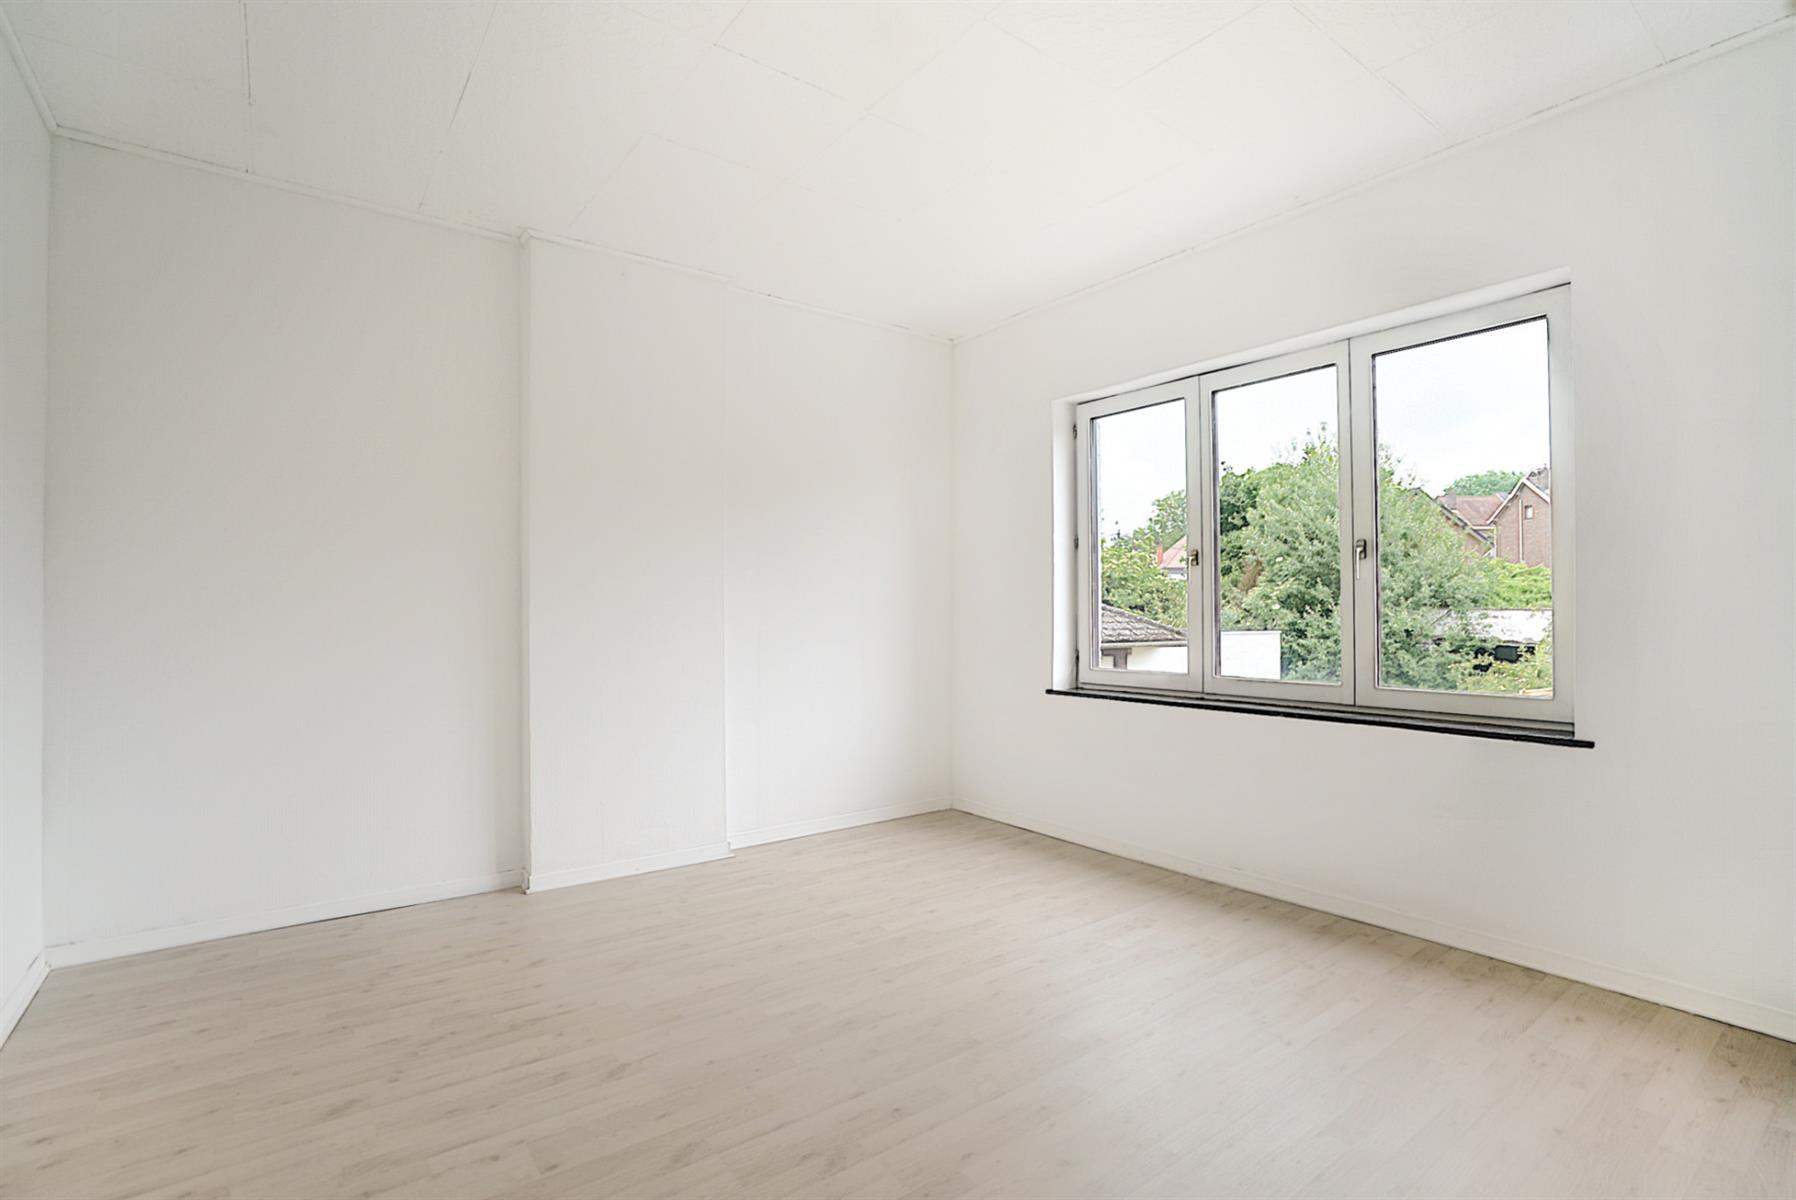 Maison - Ottignies-Louvain-la-Neuve - #3849240-8